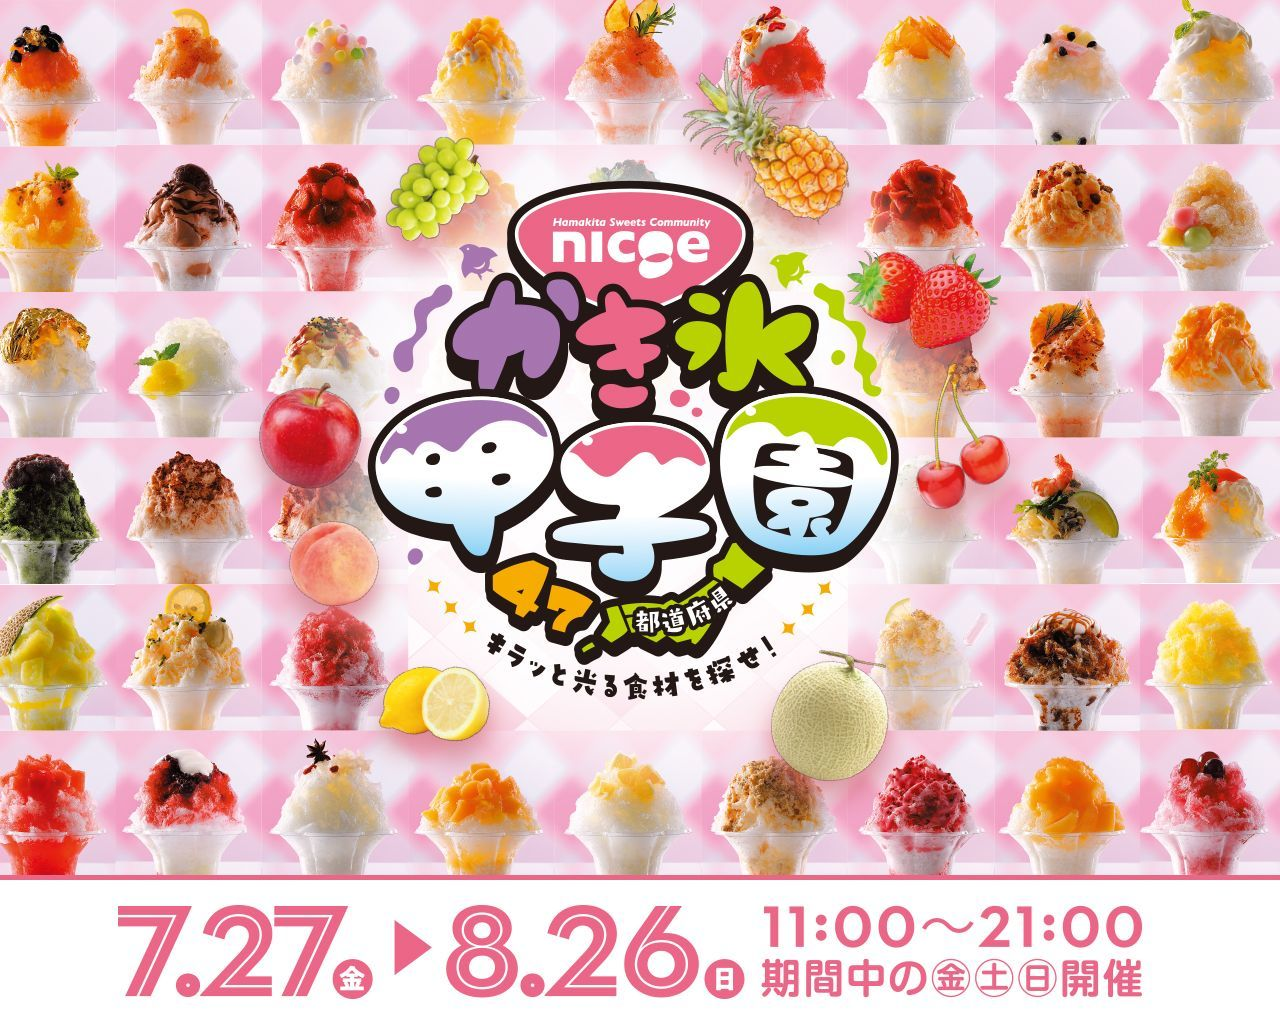 『nicoe(二コエ)かき氷甲子園 ~47都道府県 キラッと光る食材を探せ!~』